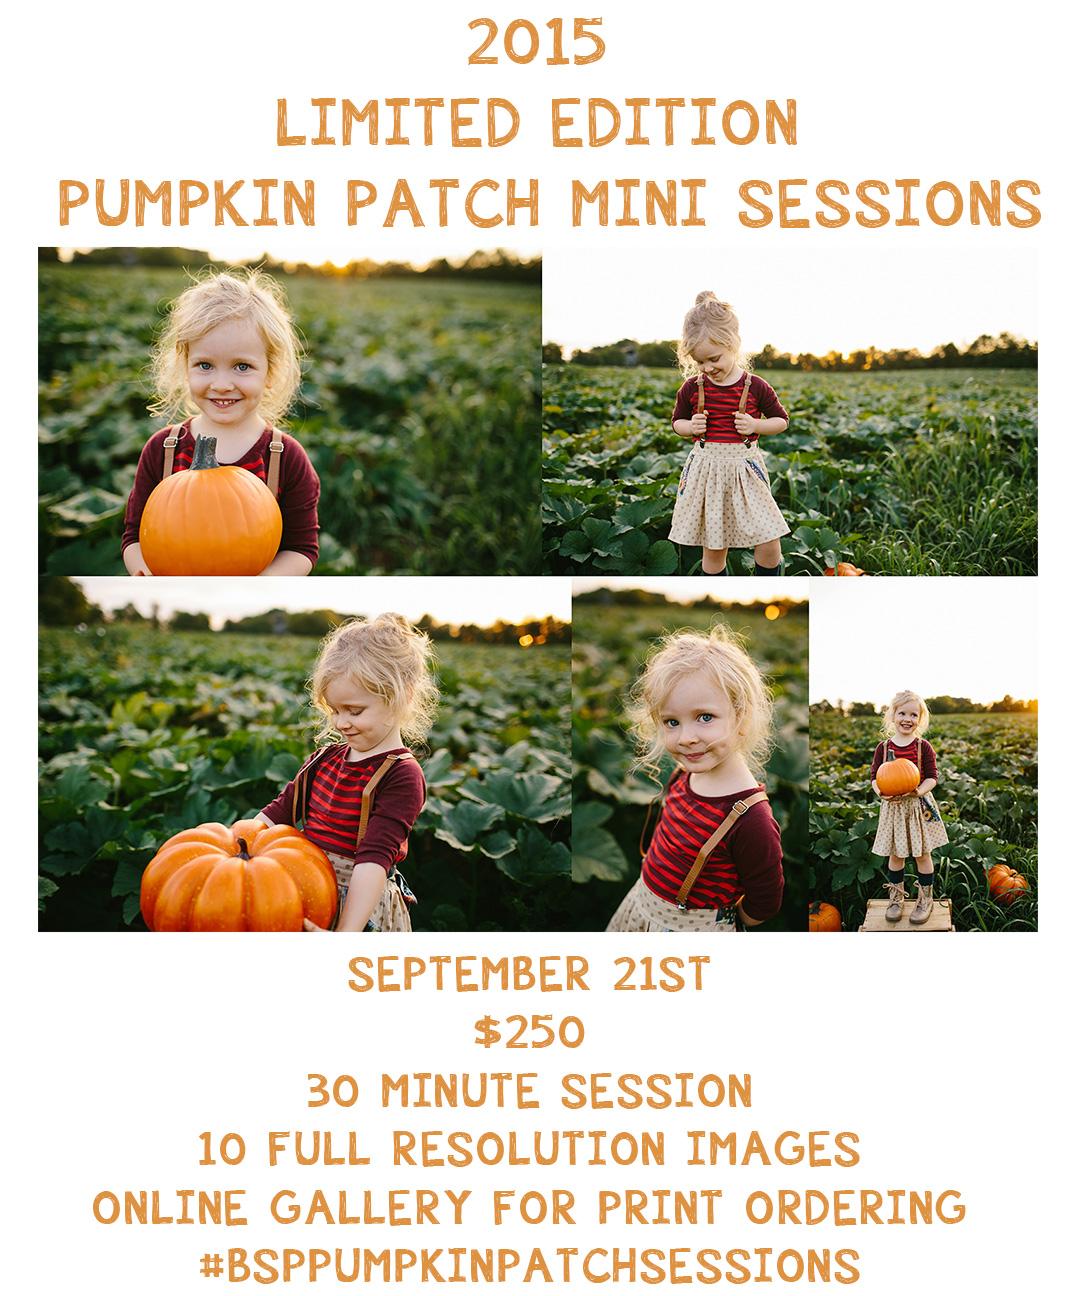 PumpkinPatchPromoblog